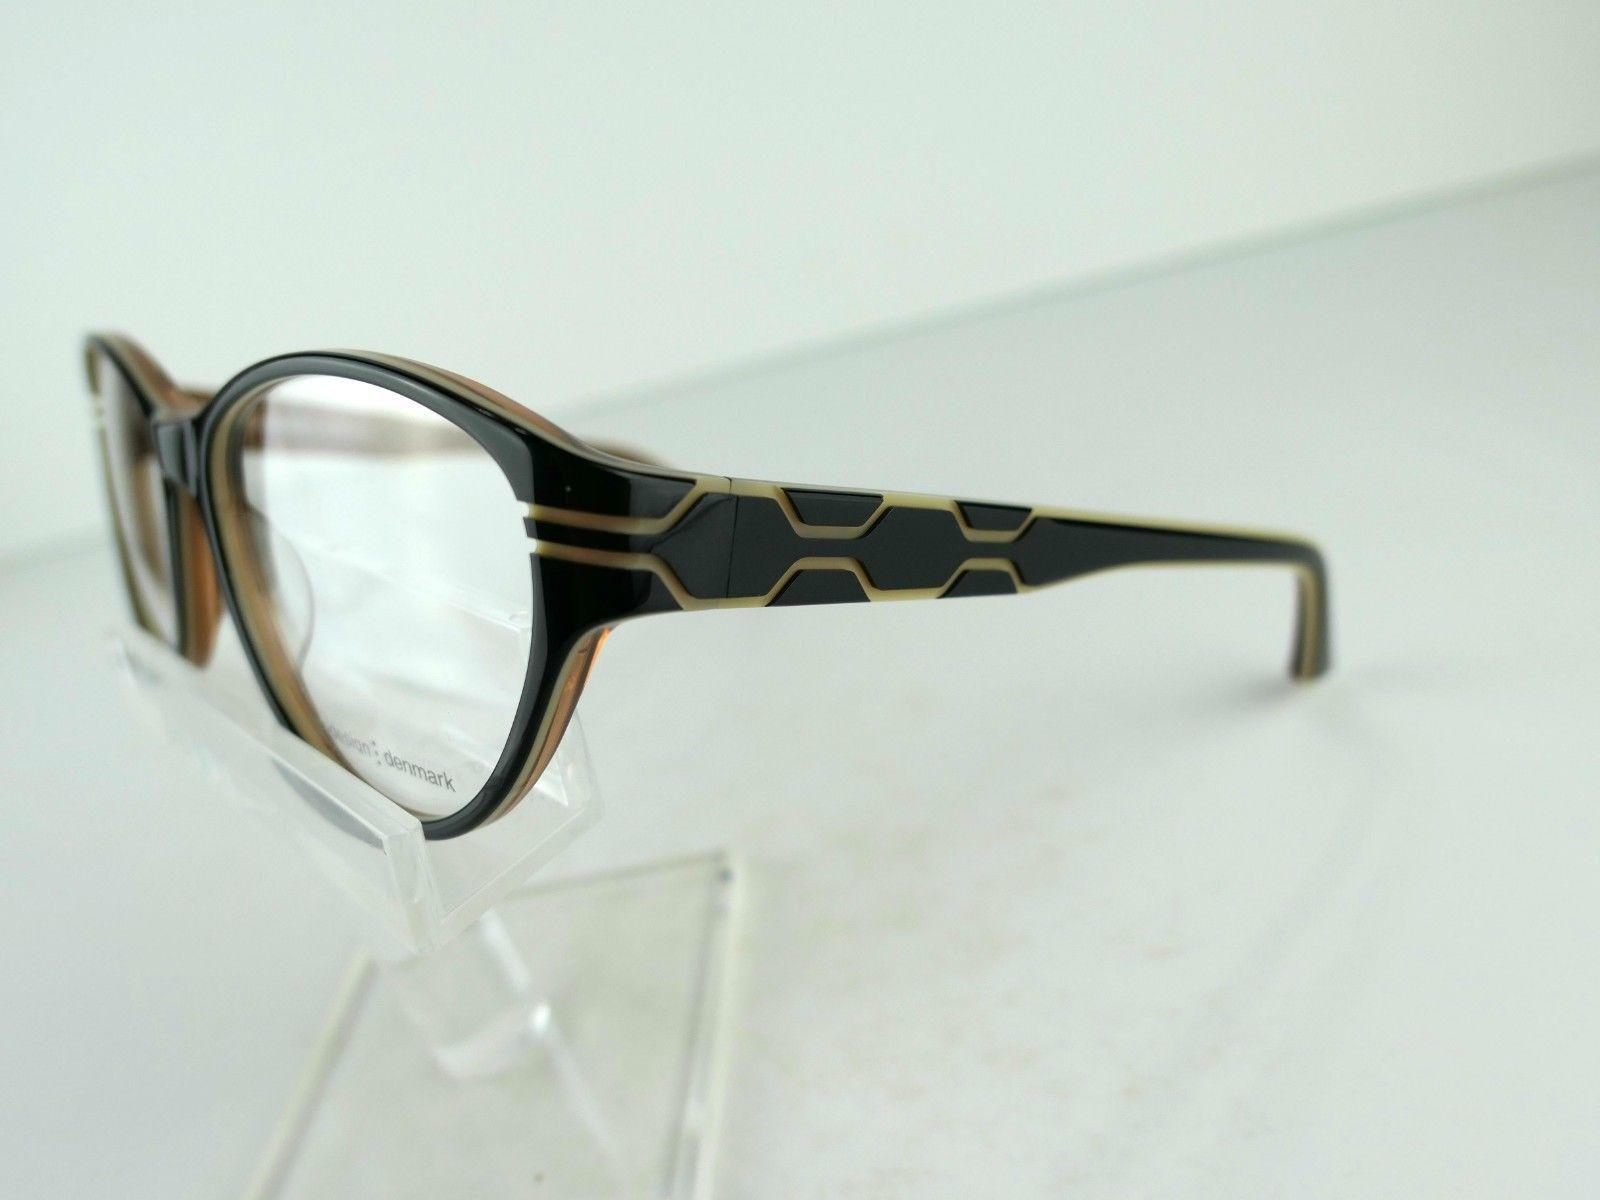 PRODESIGN DENMARK 1696 (6022) Black Shiny 55  x 16  Eyeglass Frames image 4